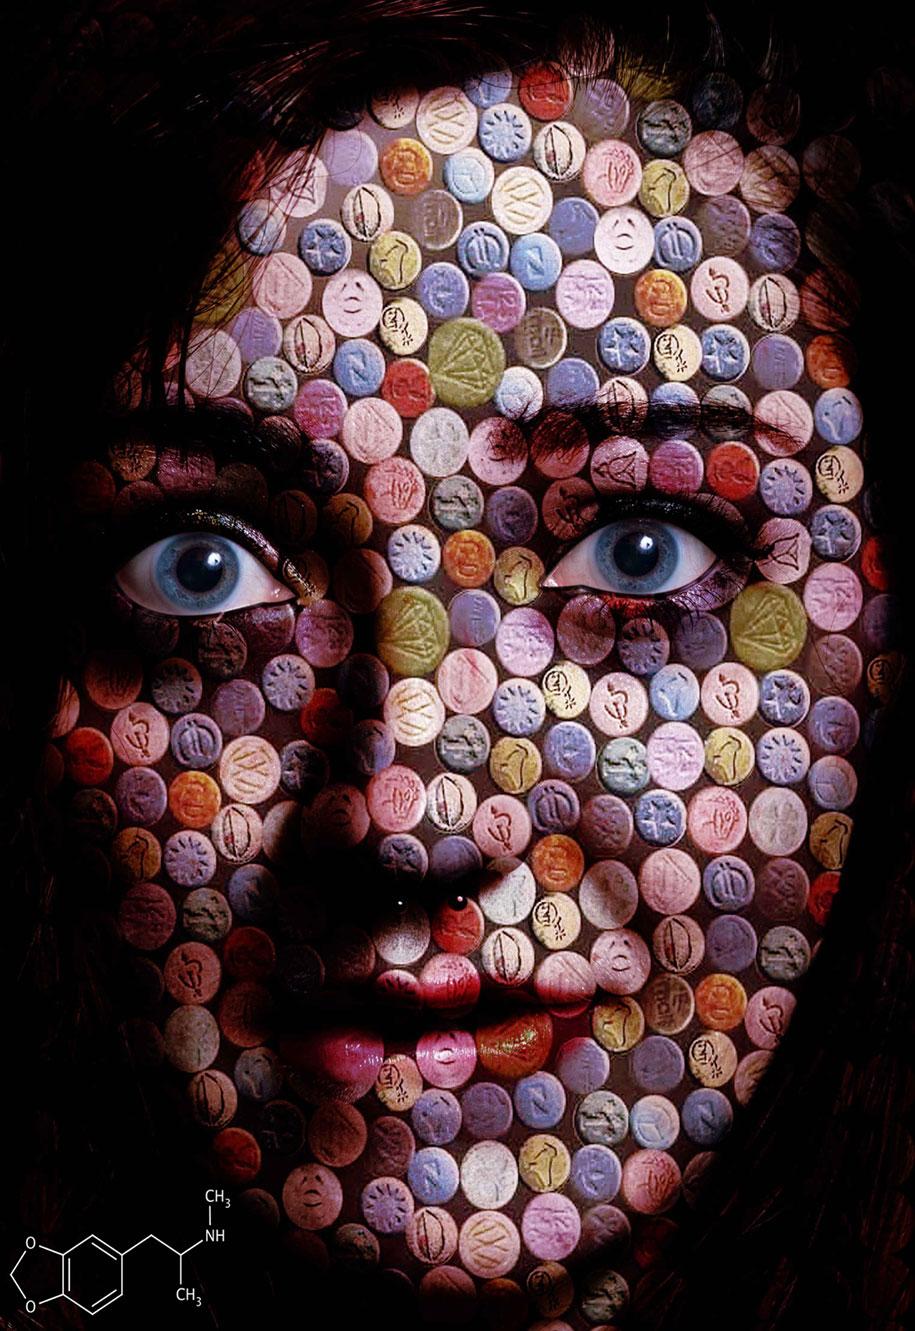 people-using-drugs-portraits-inebrination-les-baker-v-1